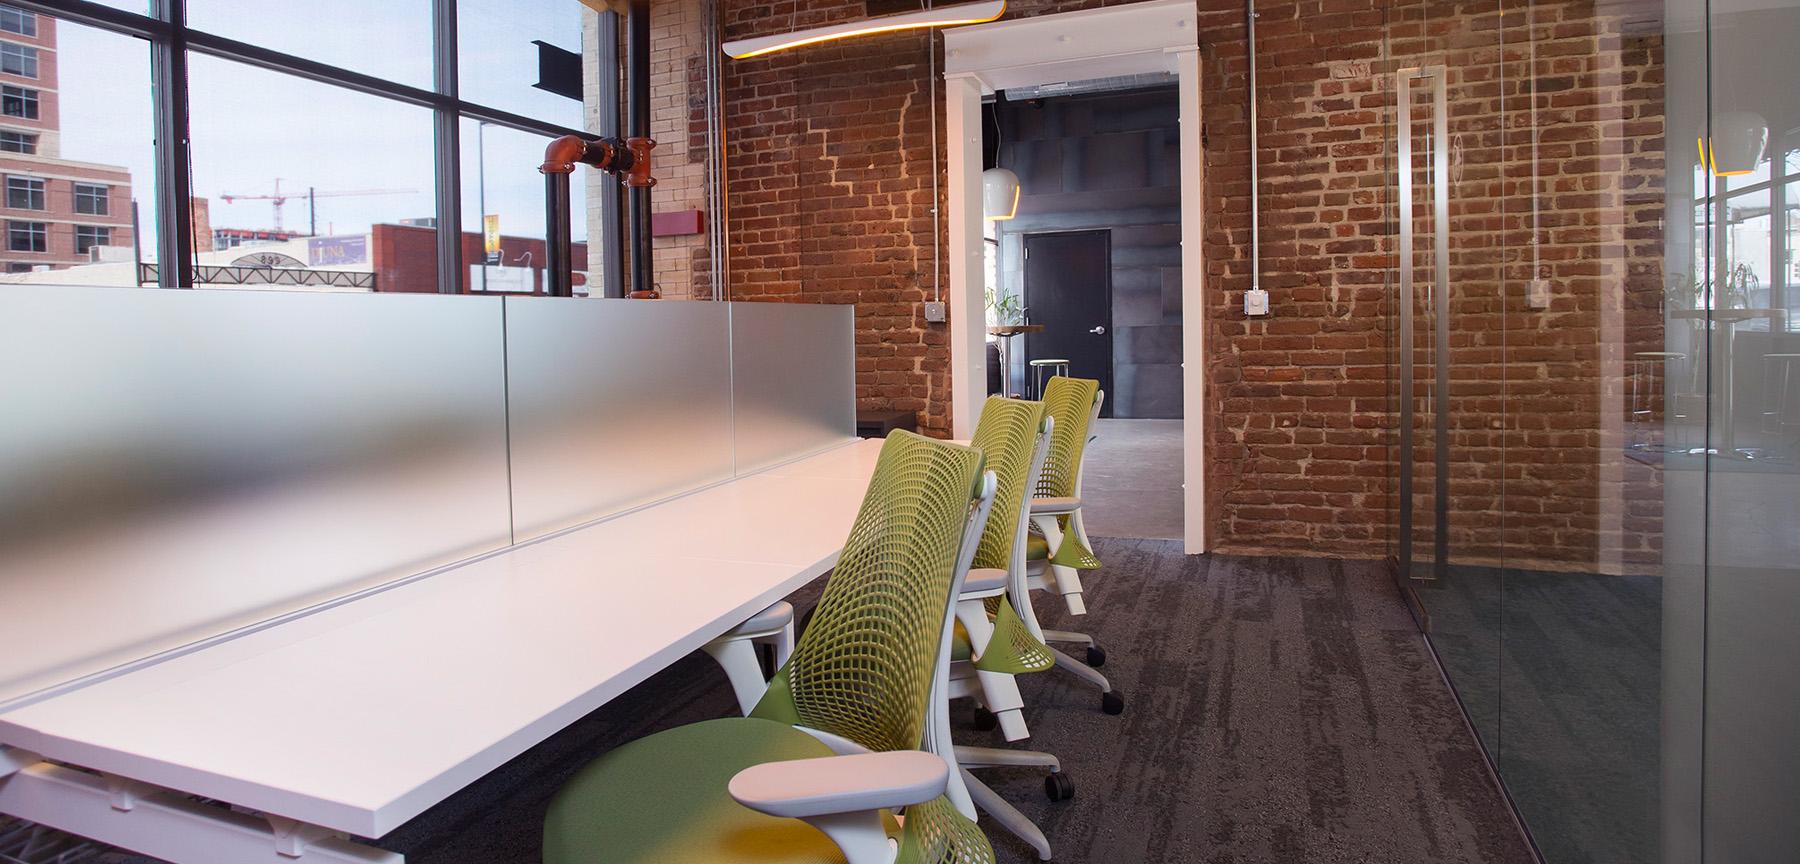 PorchLight Real Estate desks